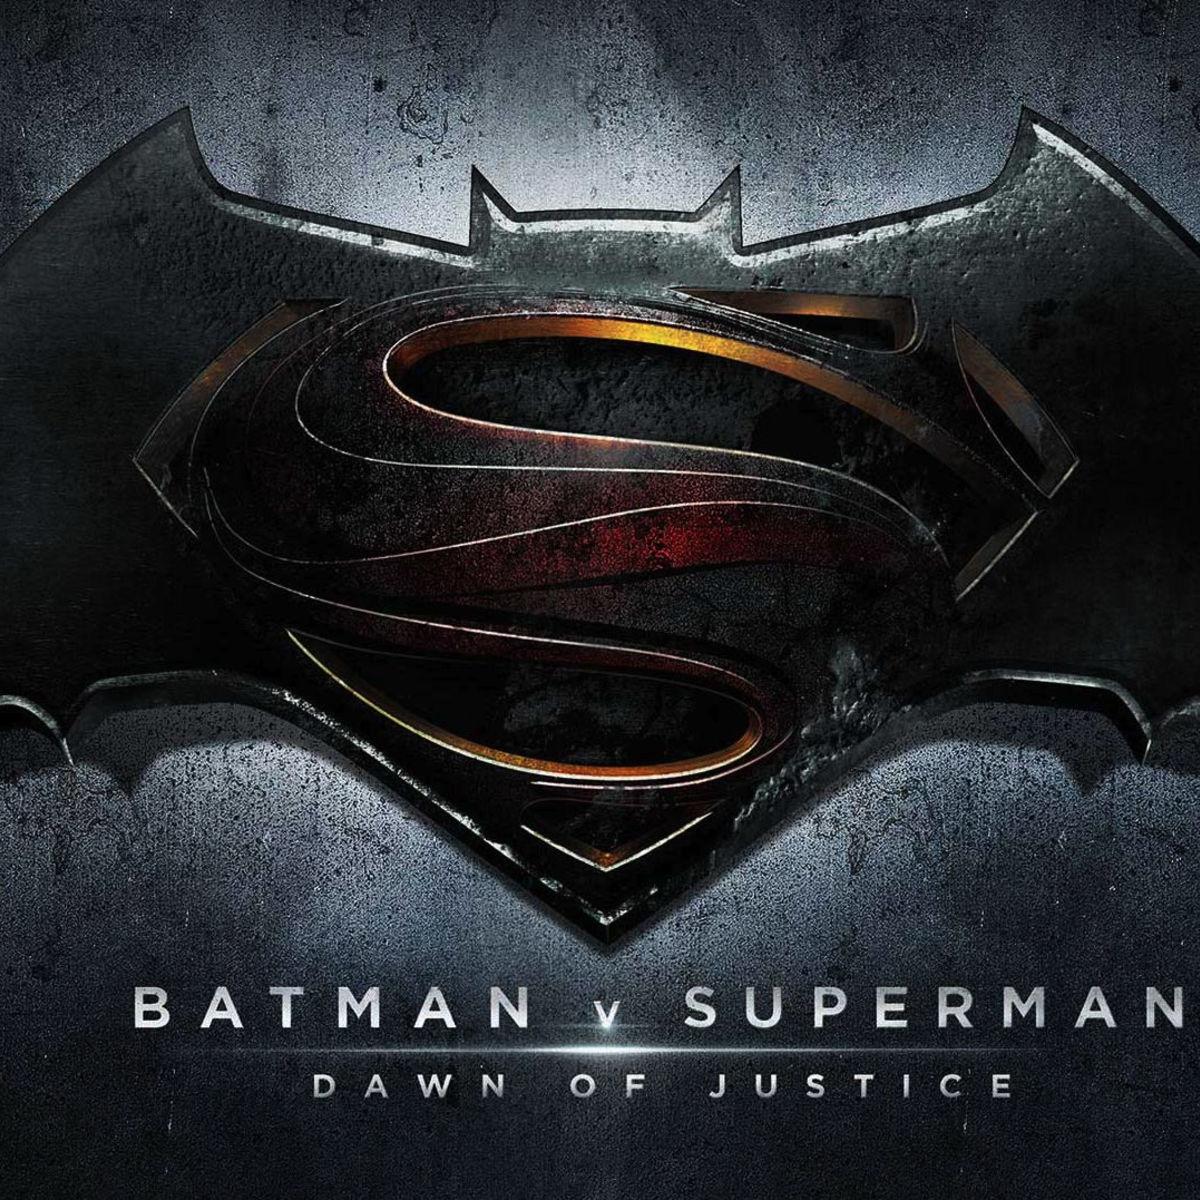 batman-vs-superman-official-logo-HD.jpg